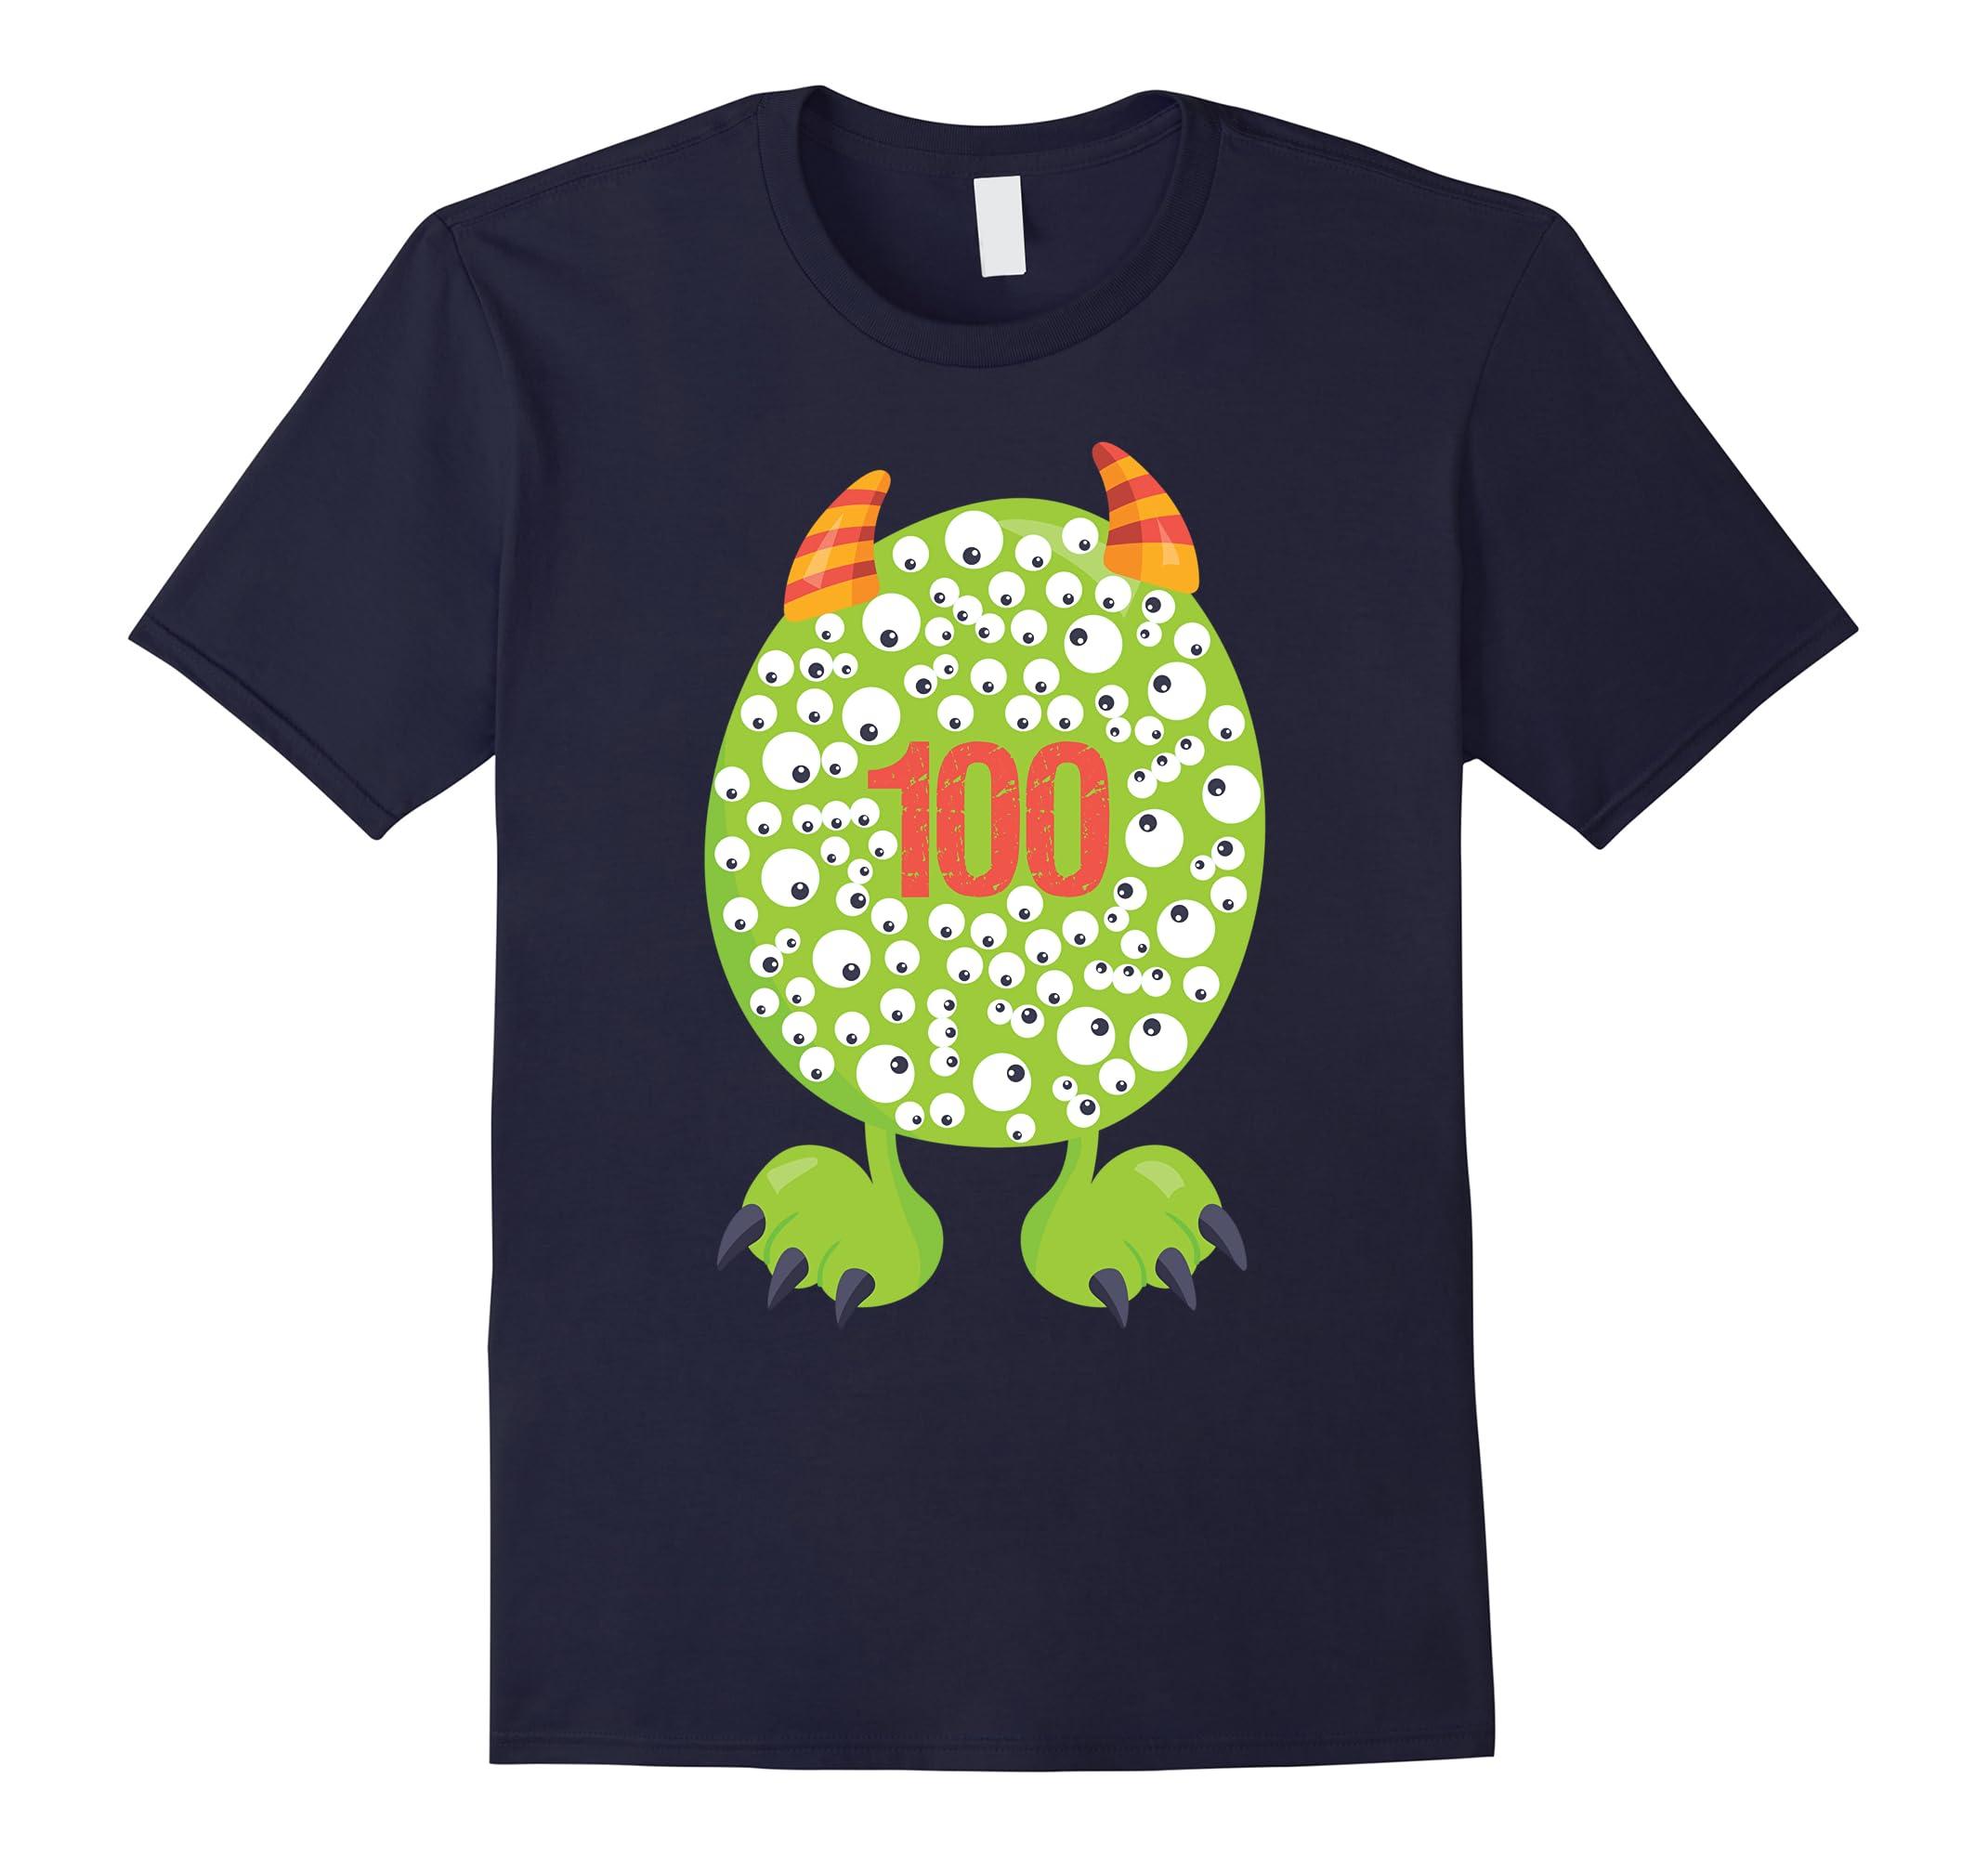 100th Day of School T Shirt Monster Happy 100 Days Kids Boy-RT